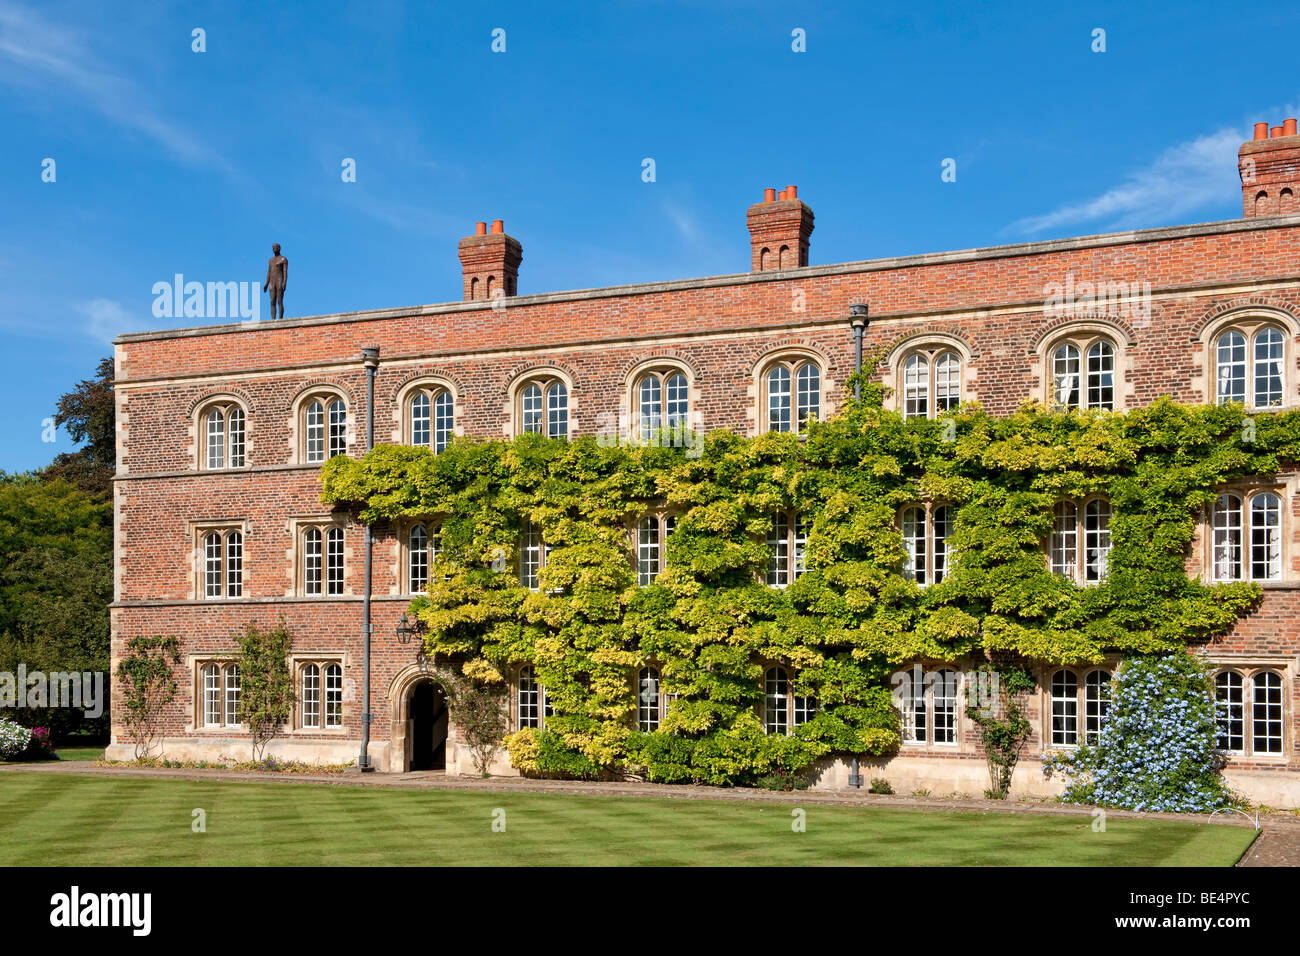 Part of Jesus College in Cambridge (Cambridge University) - Stock Image